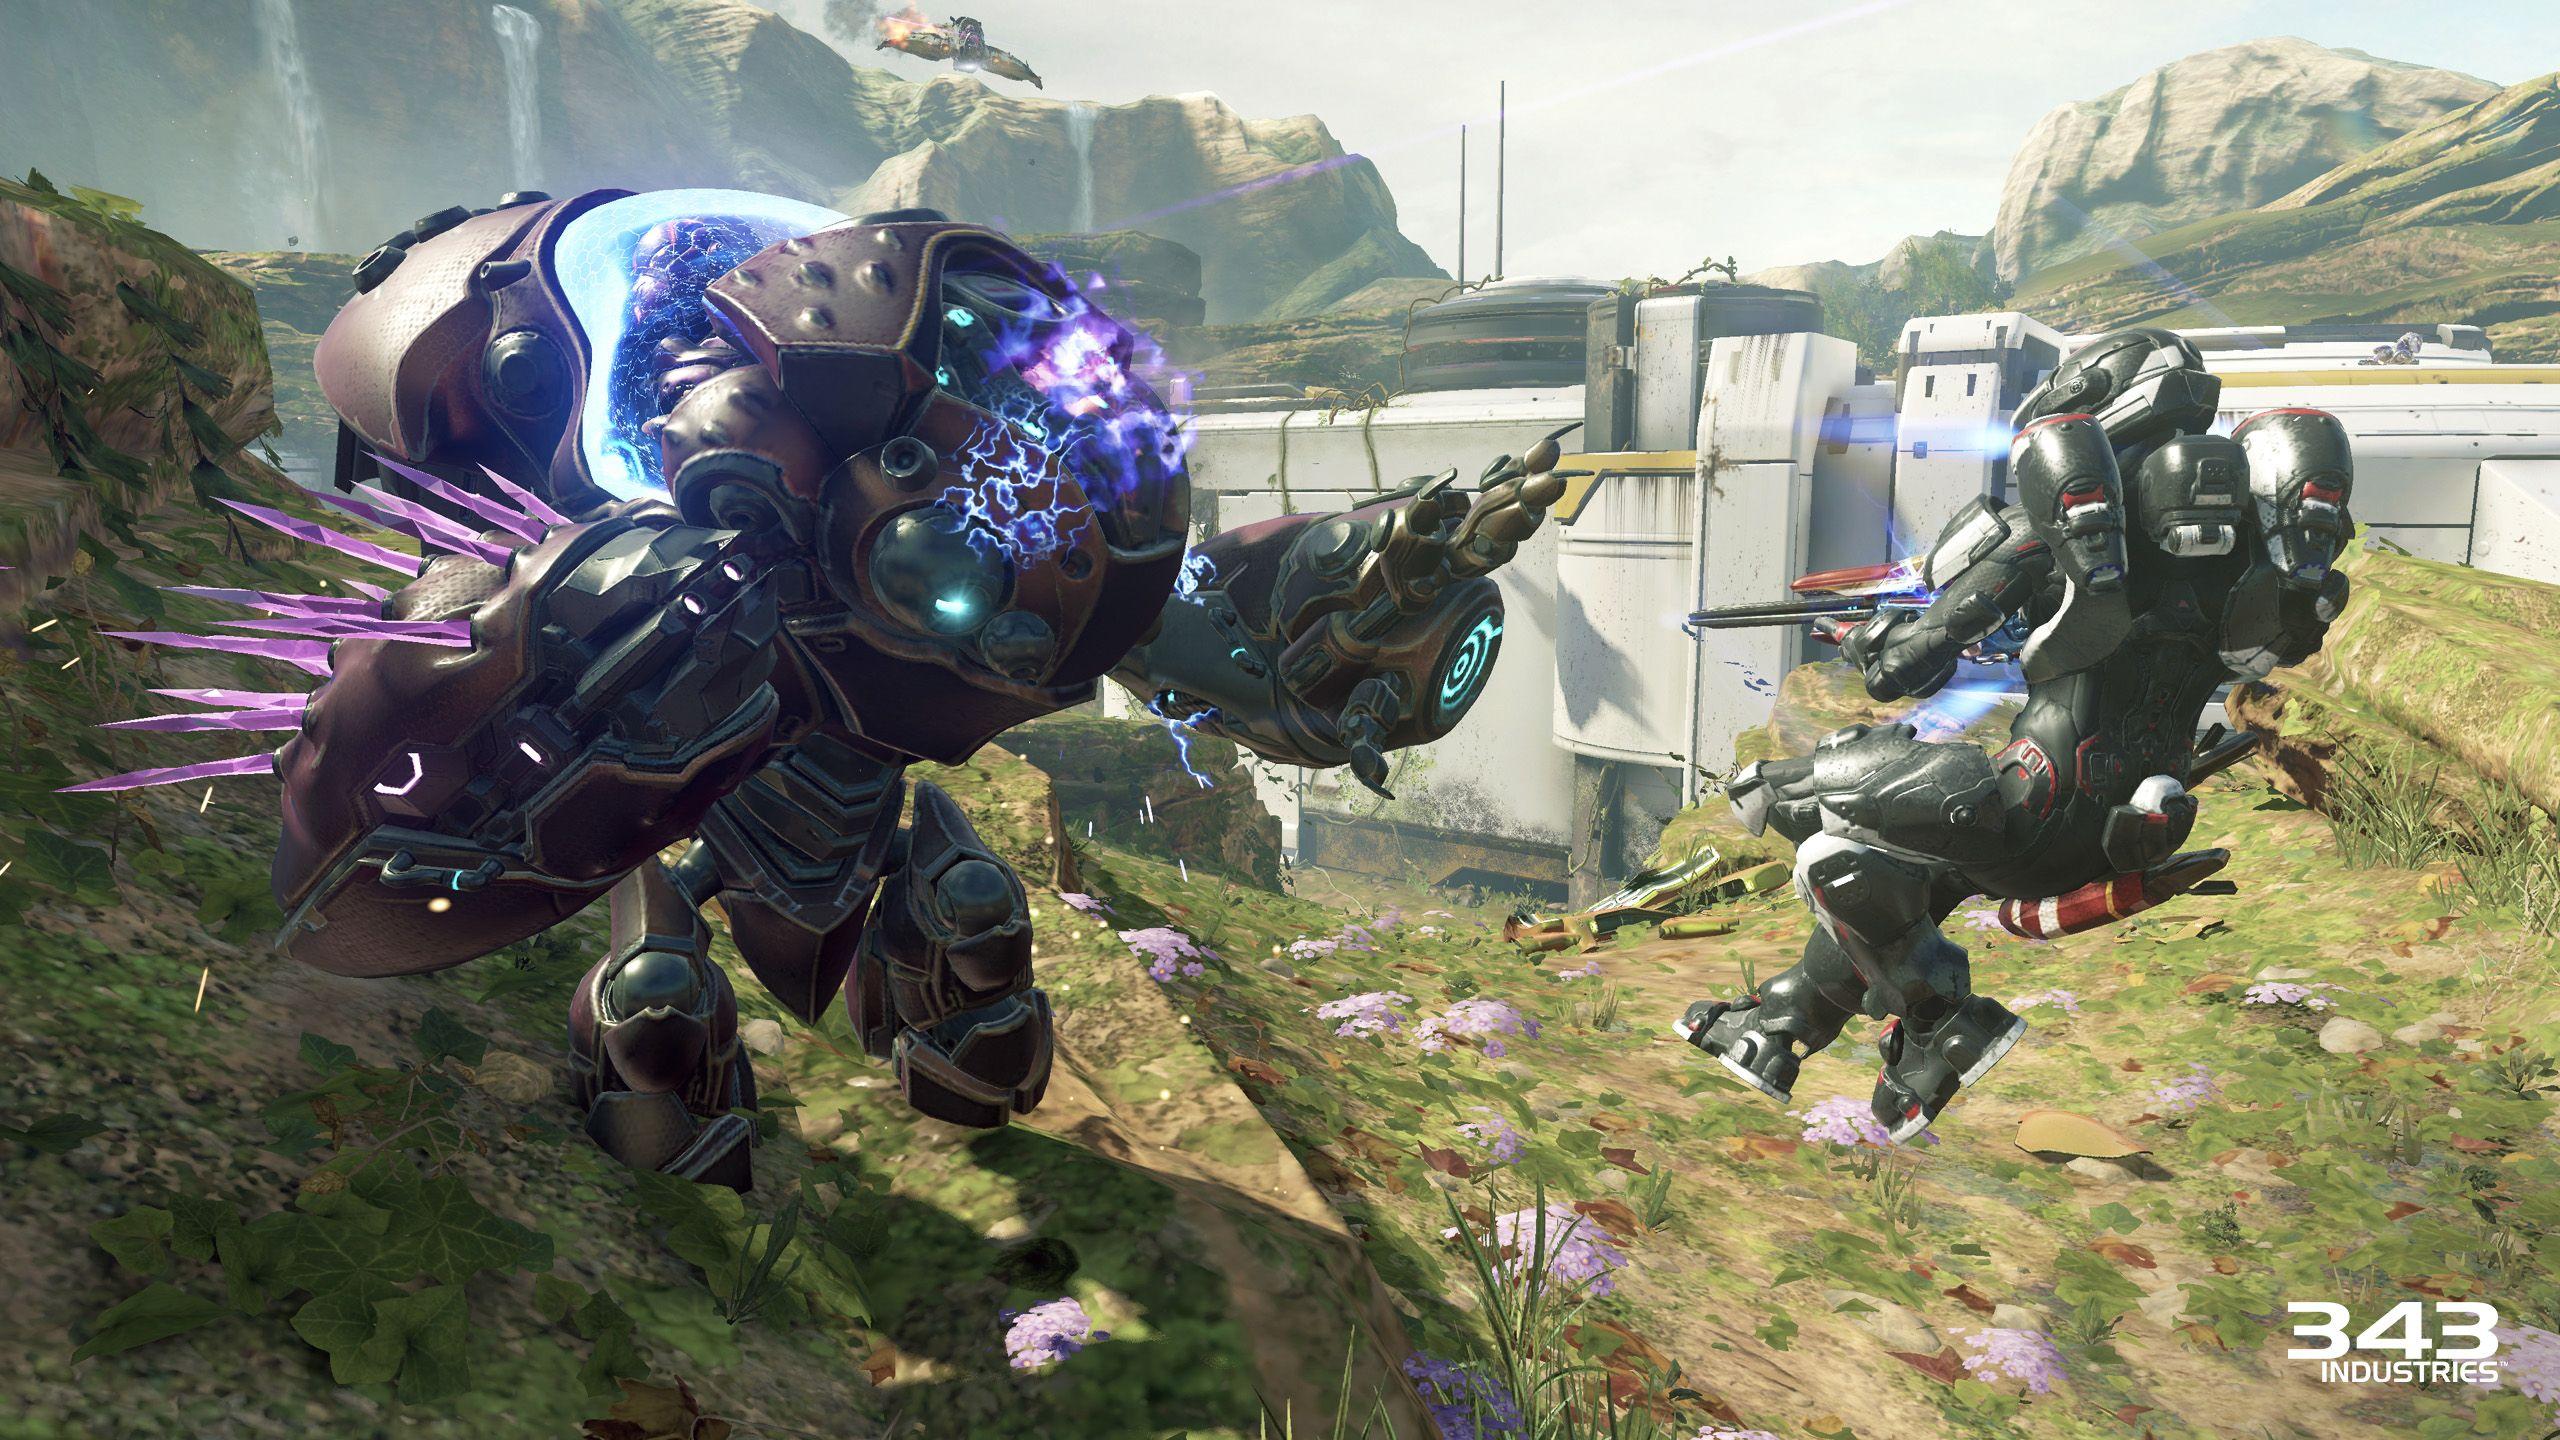 H5-Guardians-WZ-Firefight-Sanctum-Grunt-Mech-02.0